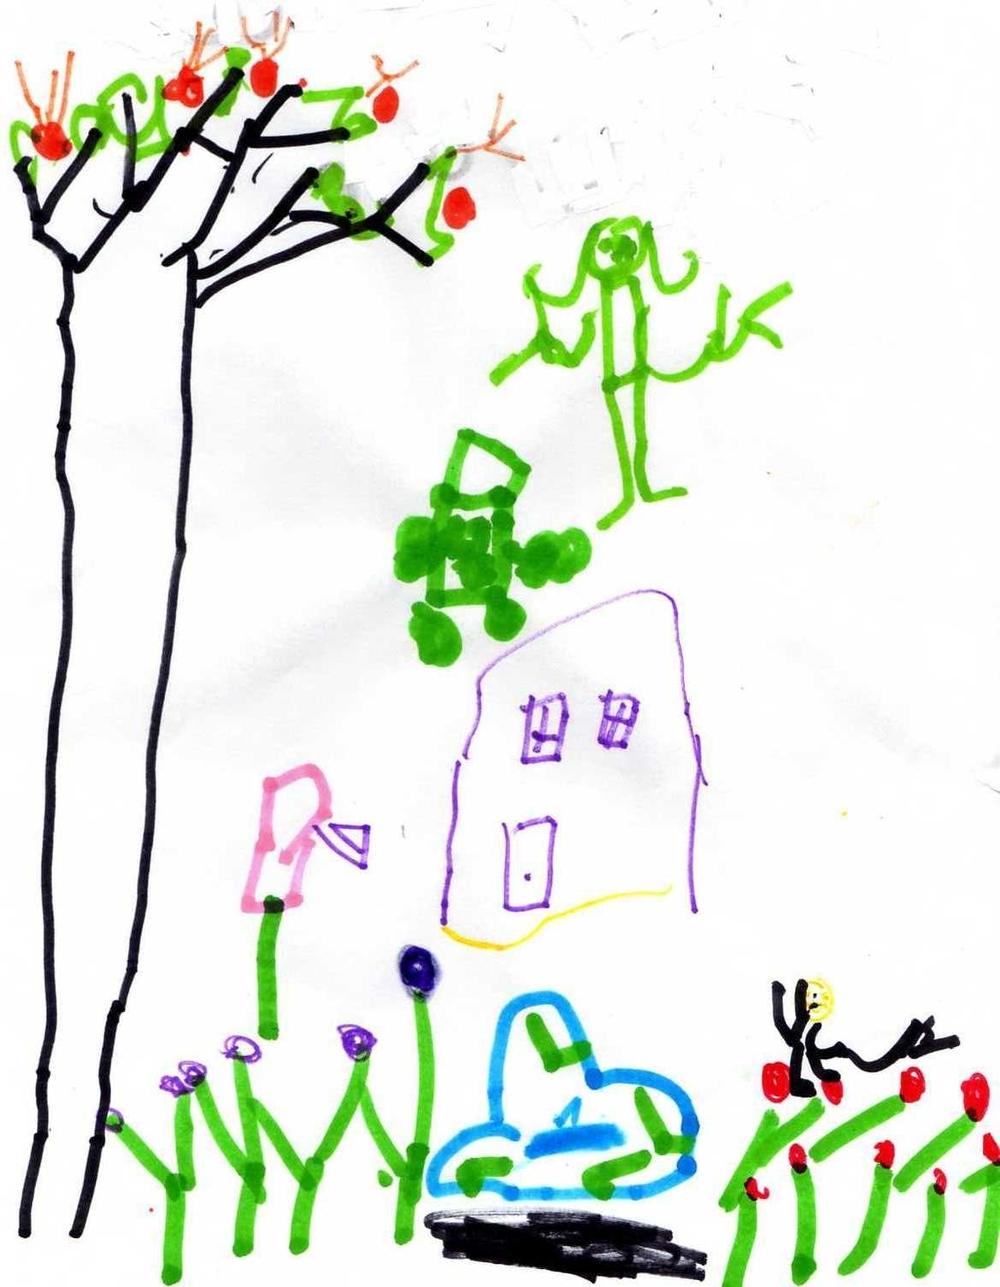 Community_Image - Neighborhood by Dareeona.JPG